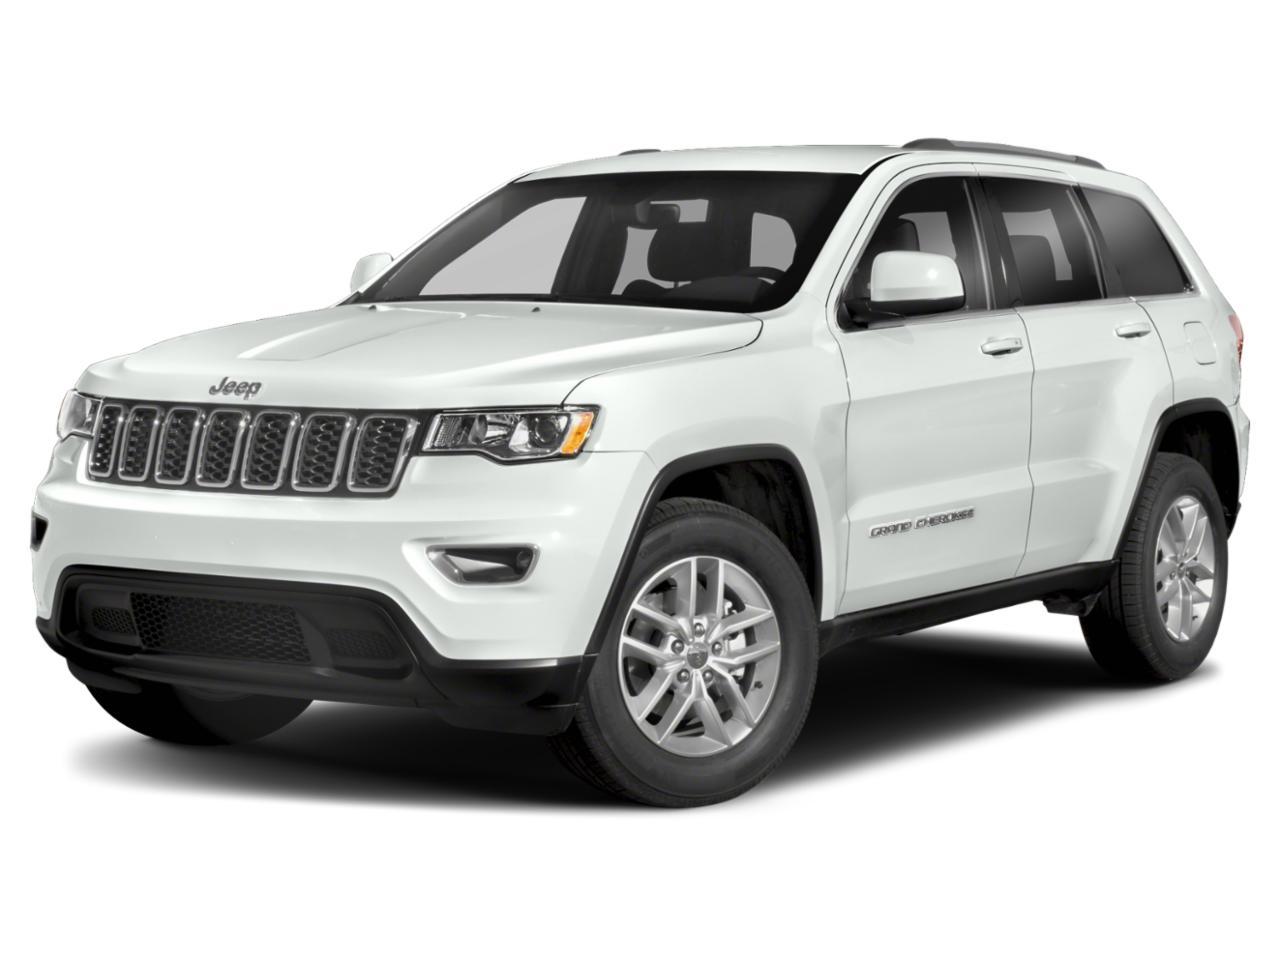 2019 Jeep Grand Cherokee Vehicle Photo in Medina, OH 44256